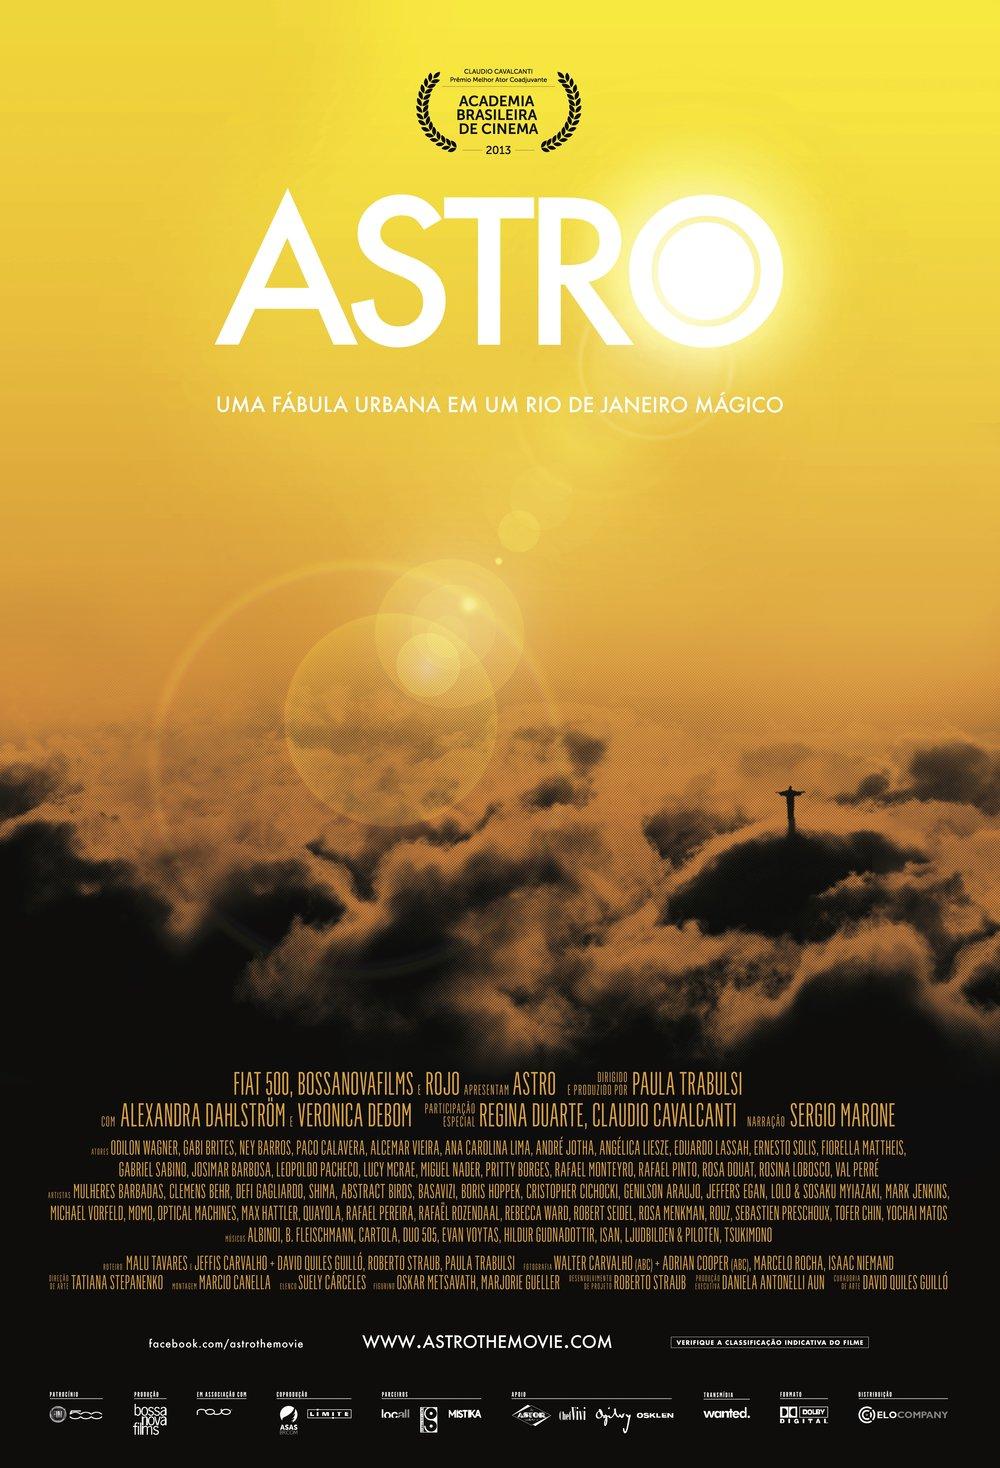 ASTRO_poster_port_peq.jpg